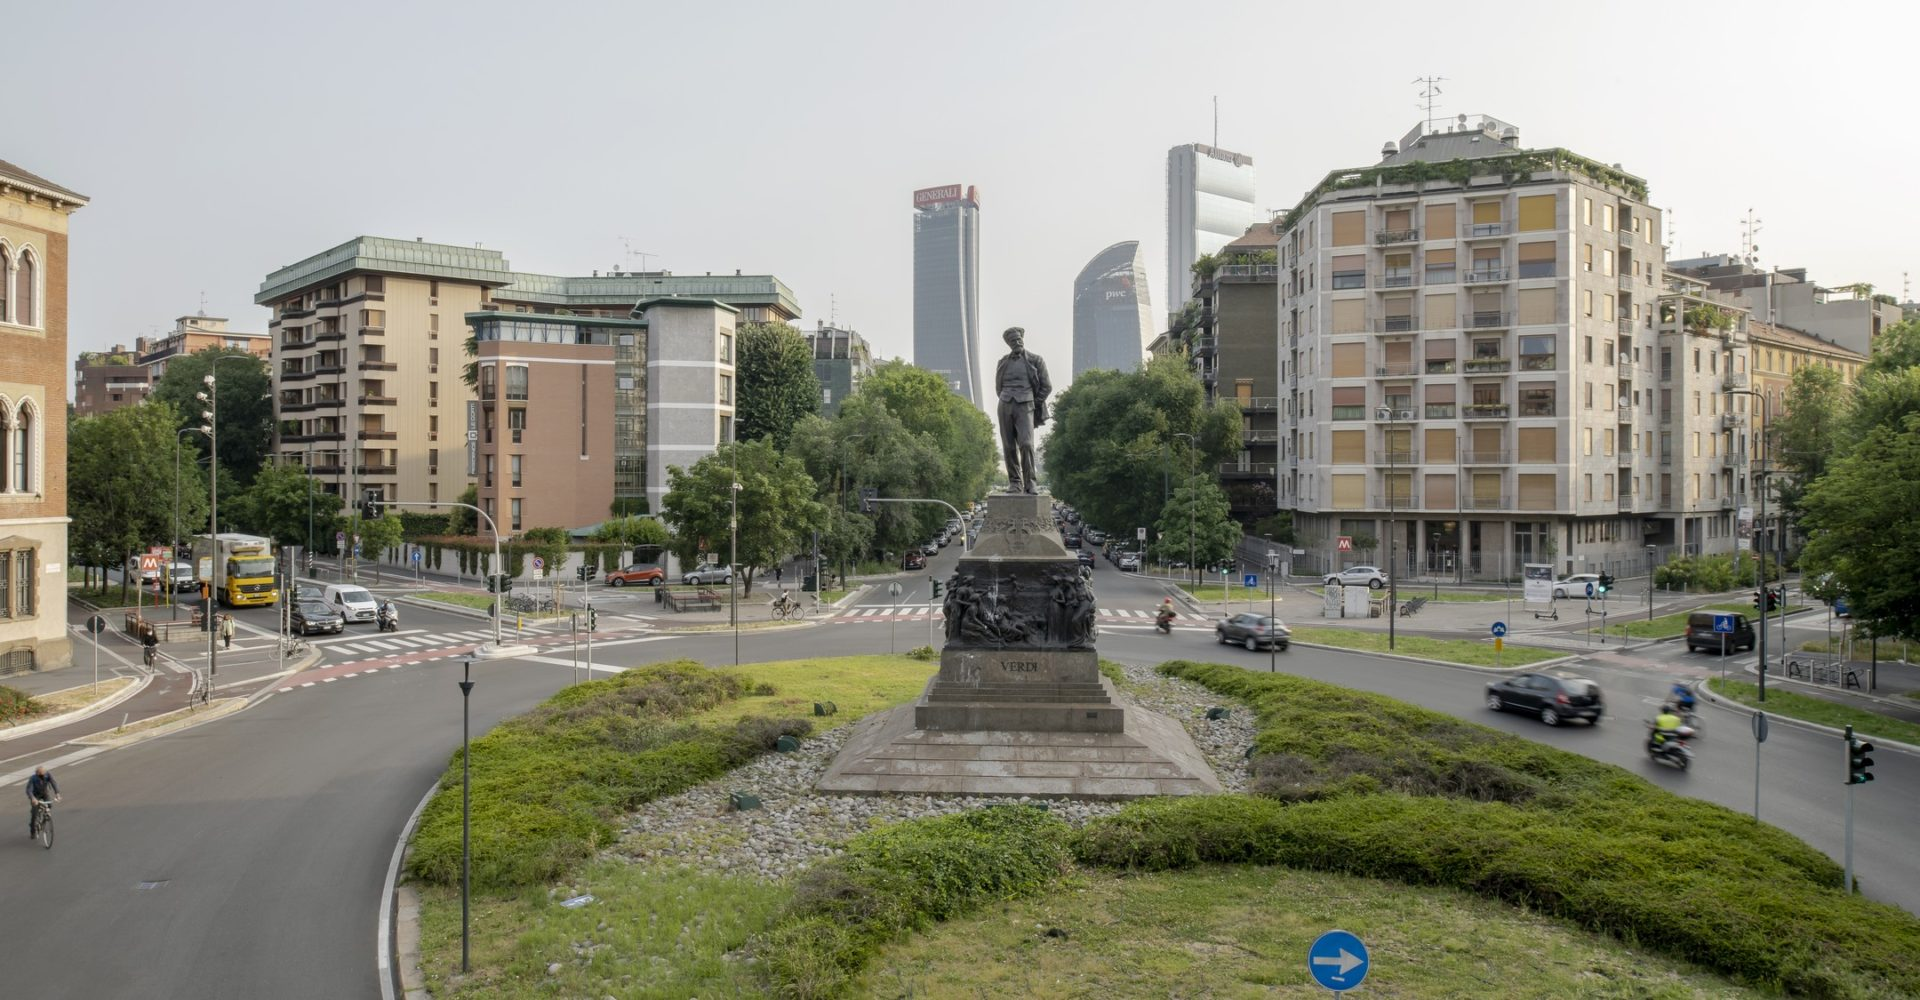 Milano in prospettiva